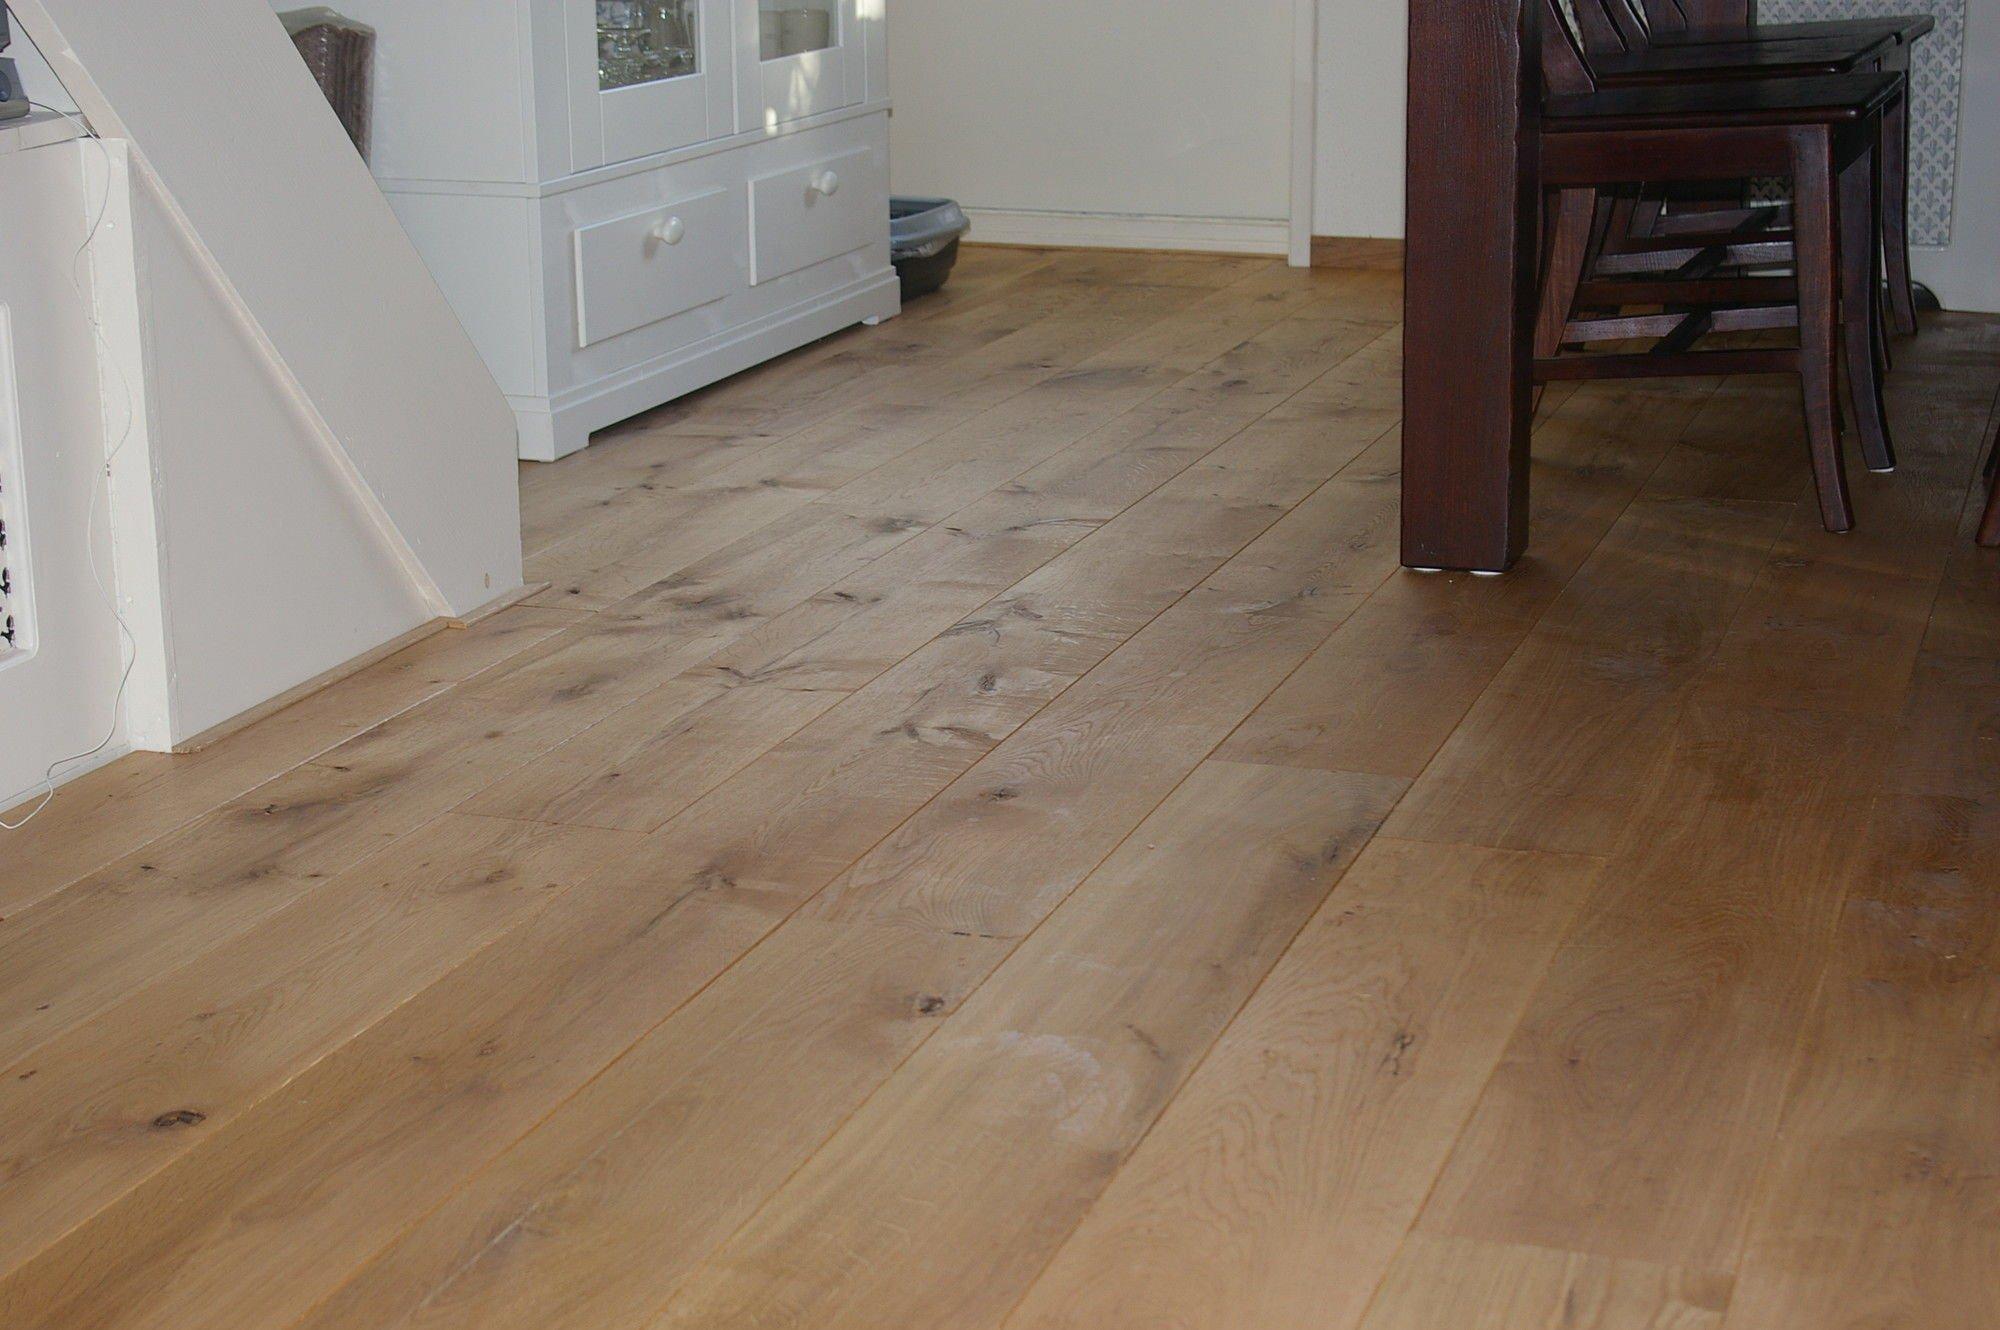 Restpartij Vinyl Vloer : Restpartij houten vloer m eiken rustiek a b cm mm top kopen